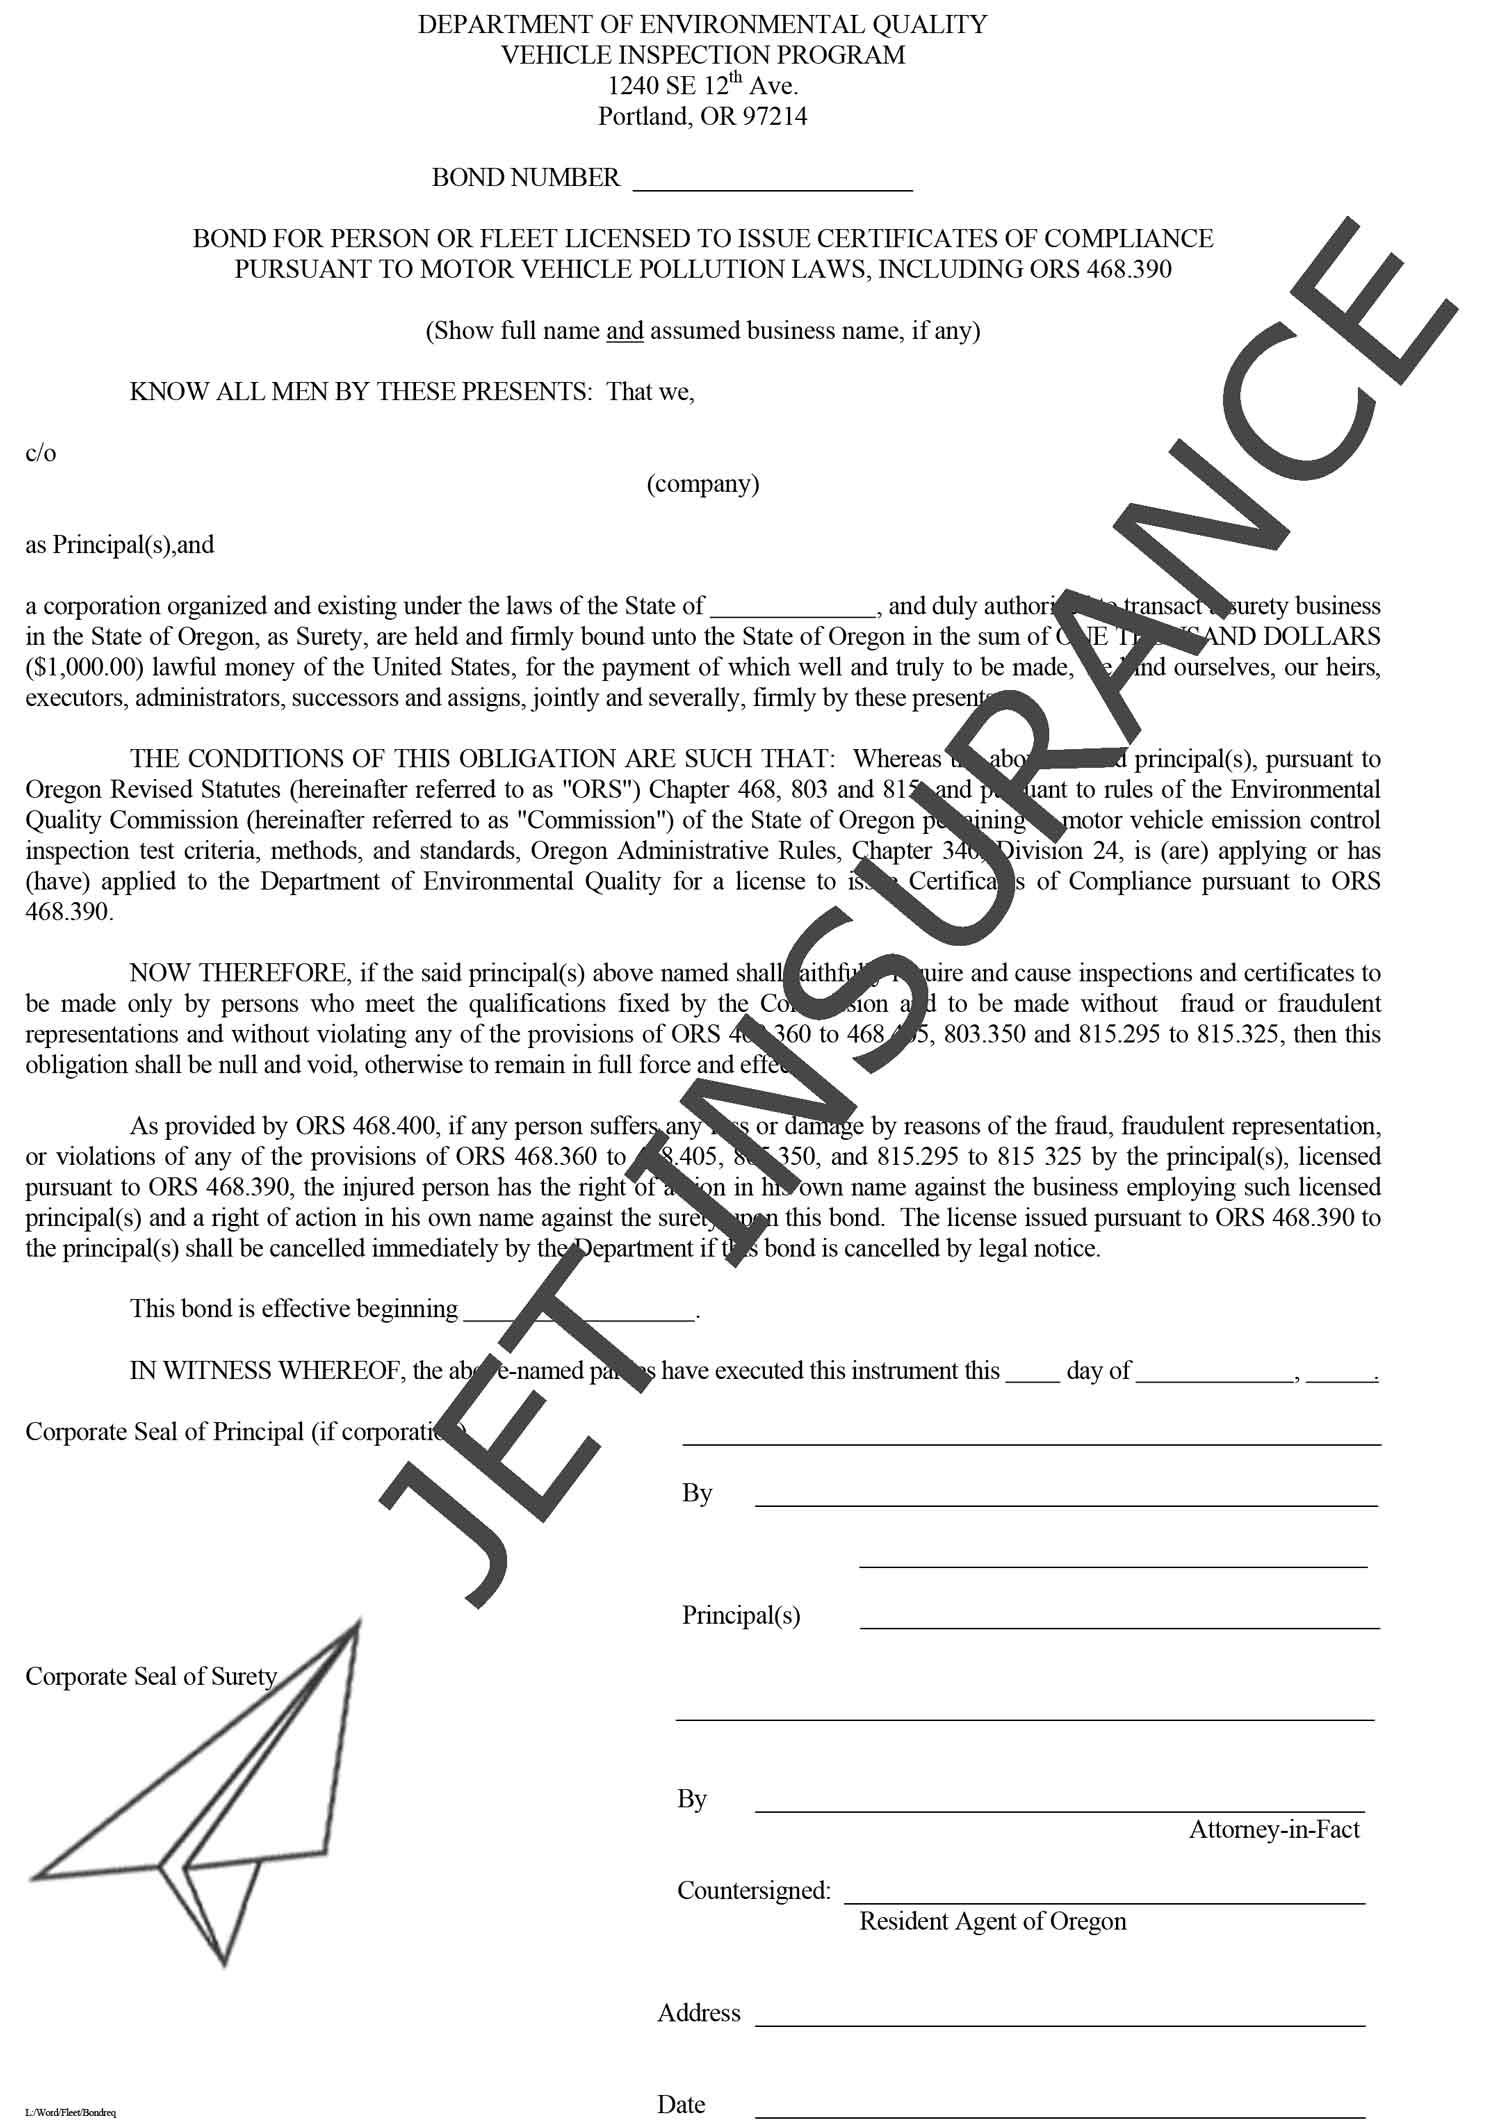 Oregon Motor Vehicle Inspection Bond Form